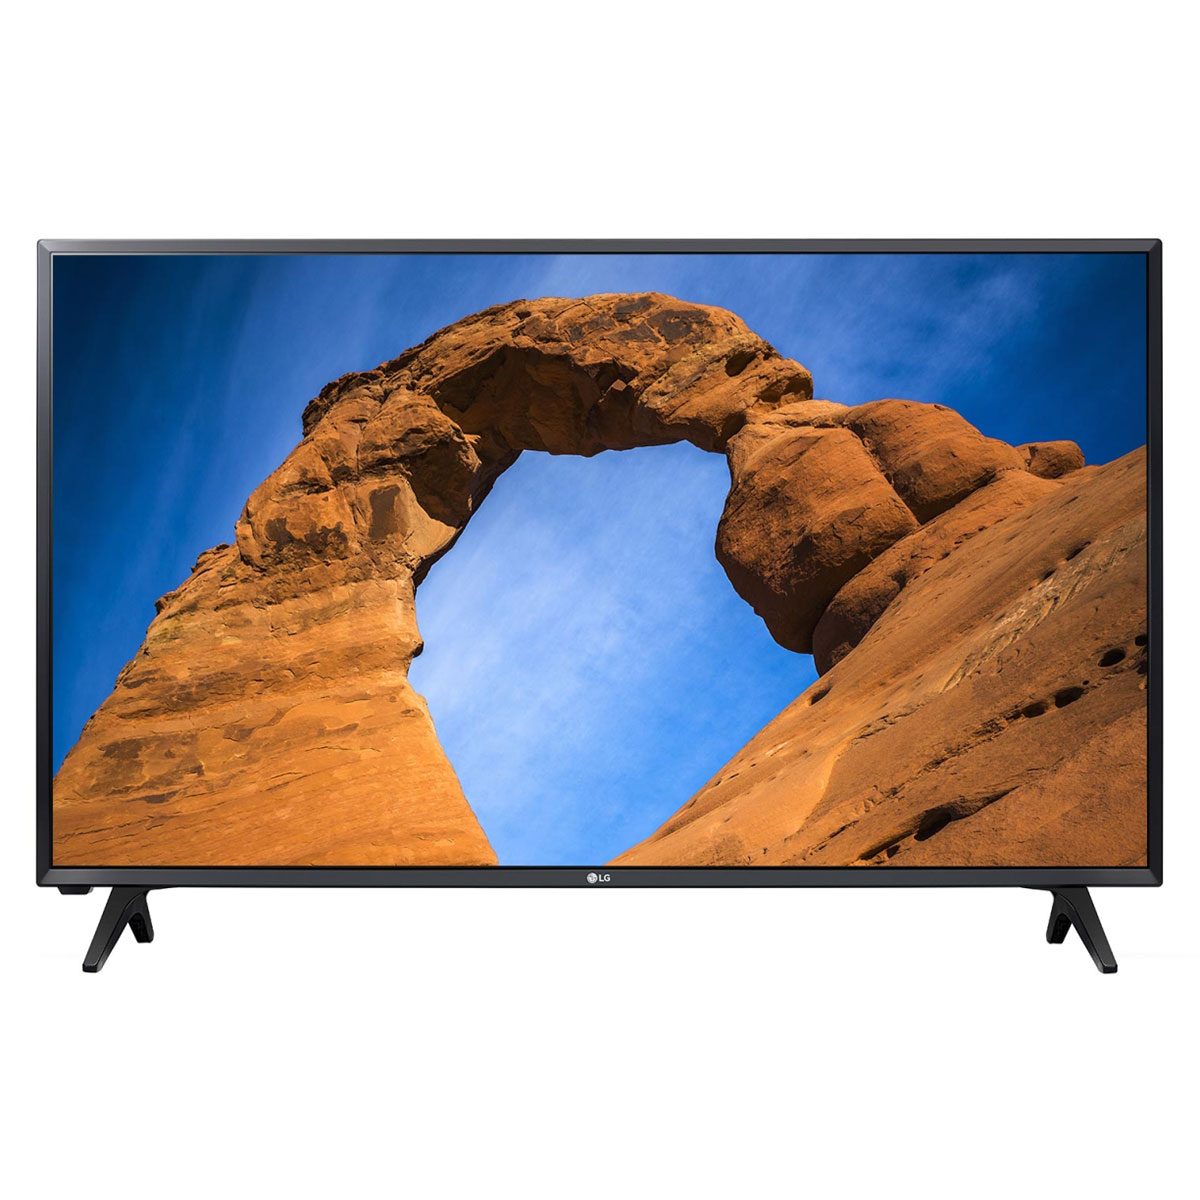 "TV LG 43LK5000 Téléviseur LED Full HD 43"" (109 cm) 16/9 - 1920 x 1080 pixels - HDTV 1080p - 200 Hz"